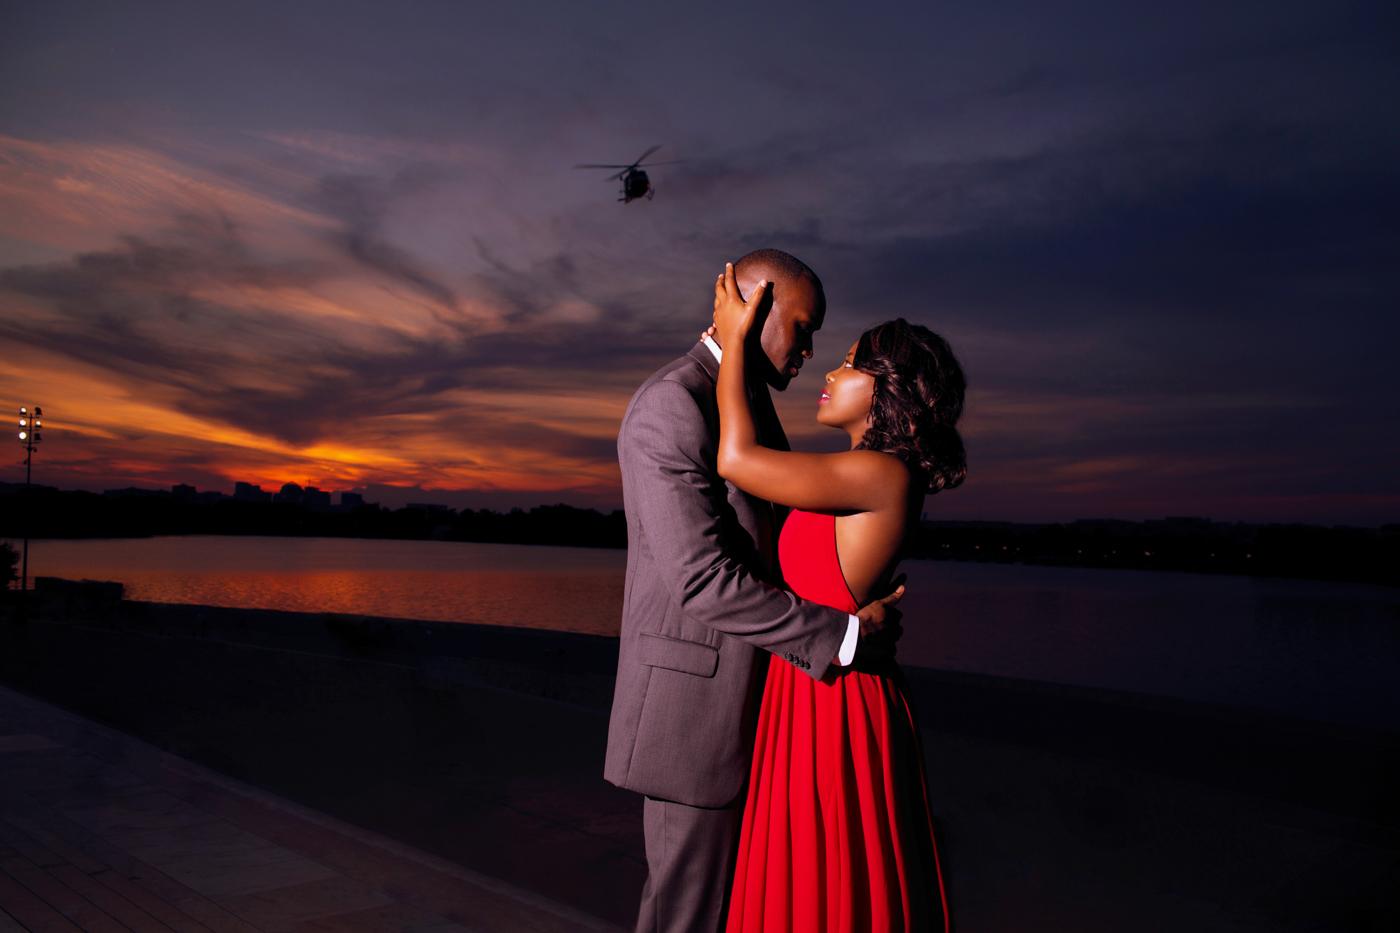 Jessica-Daniel-Engagement-Photo-Shoot-in-the-heart-of-Washington-DC-Ksenia-Pro-Photography-14